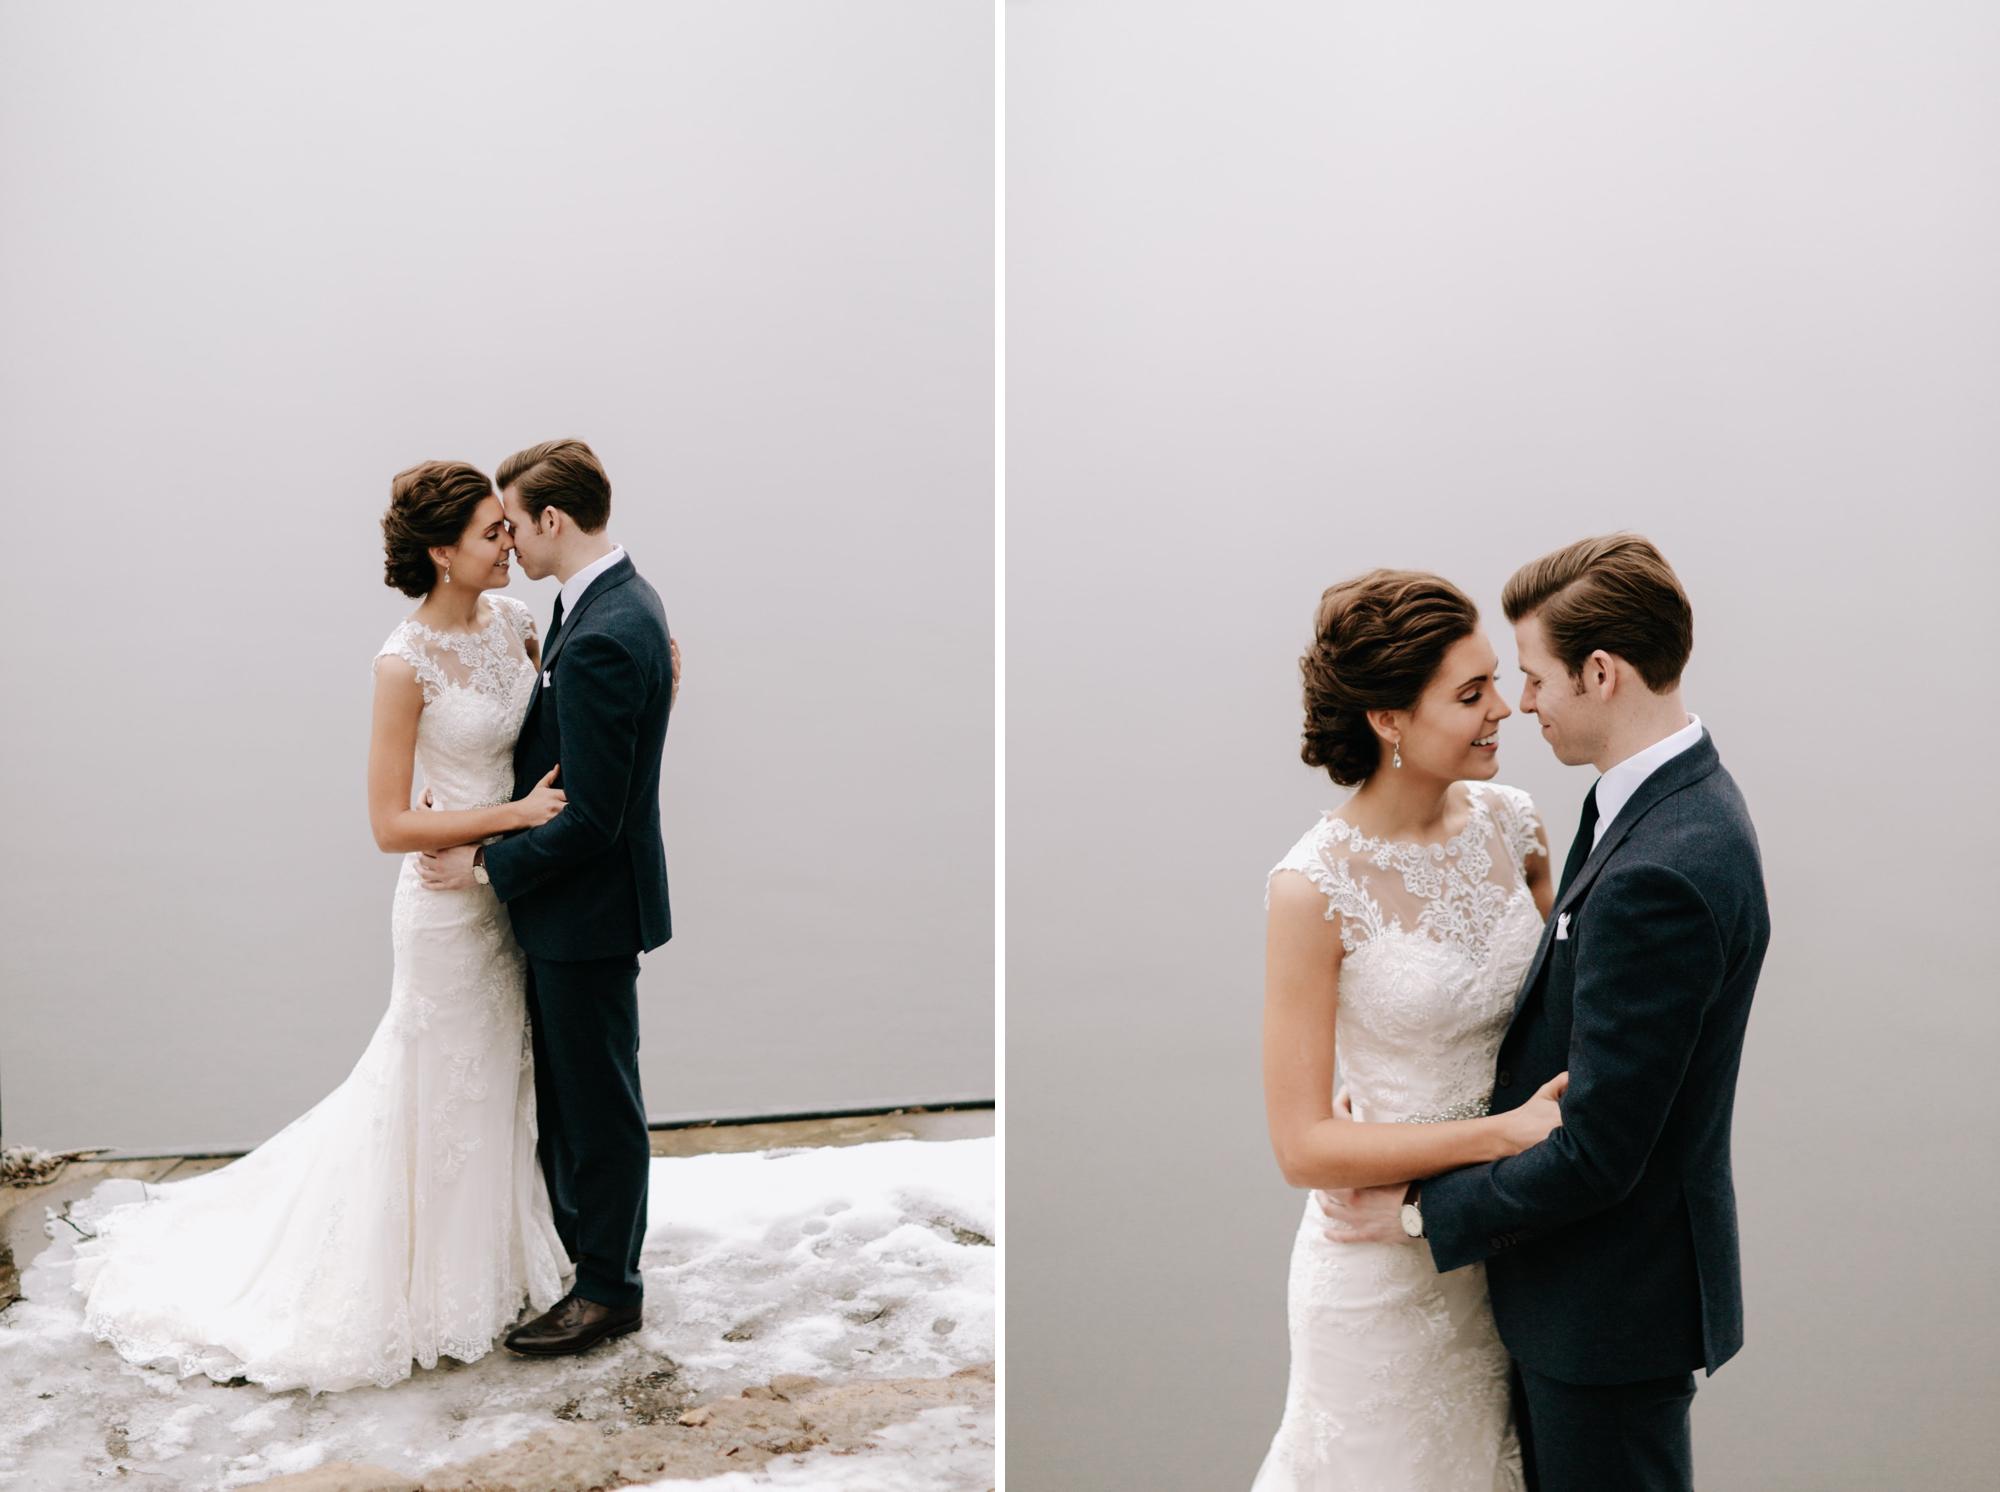 Nicollet-Island-Pavilion-Winter-Wedding-Minneapolis_21.jpg